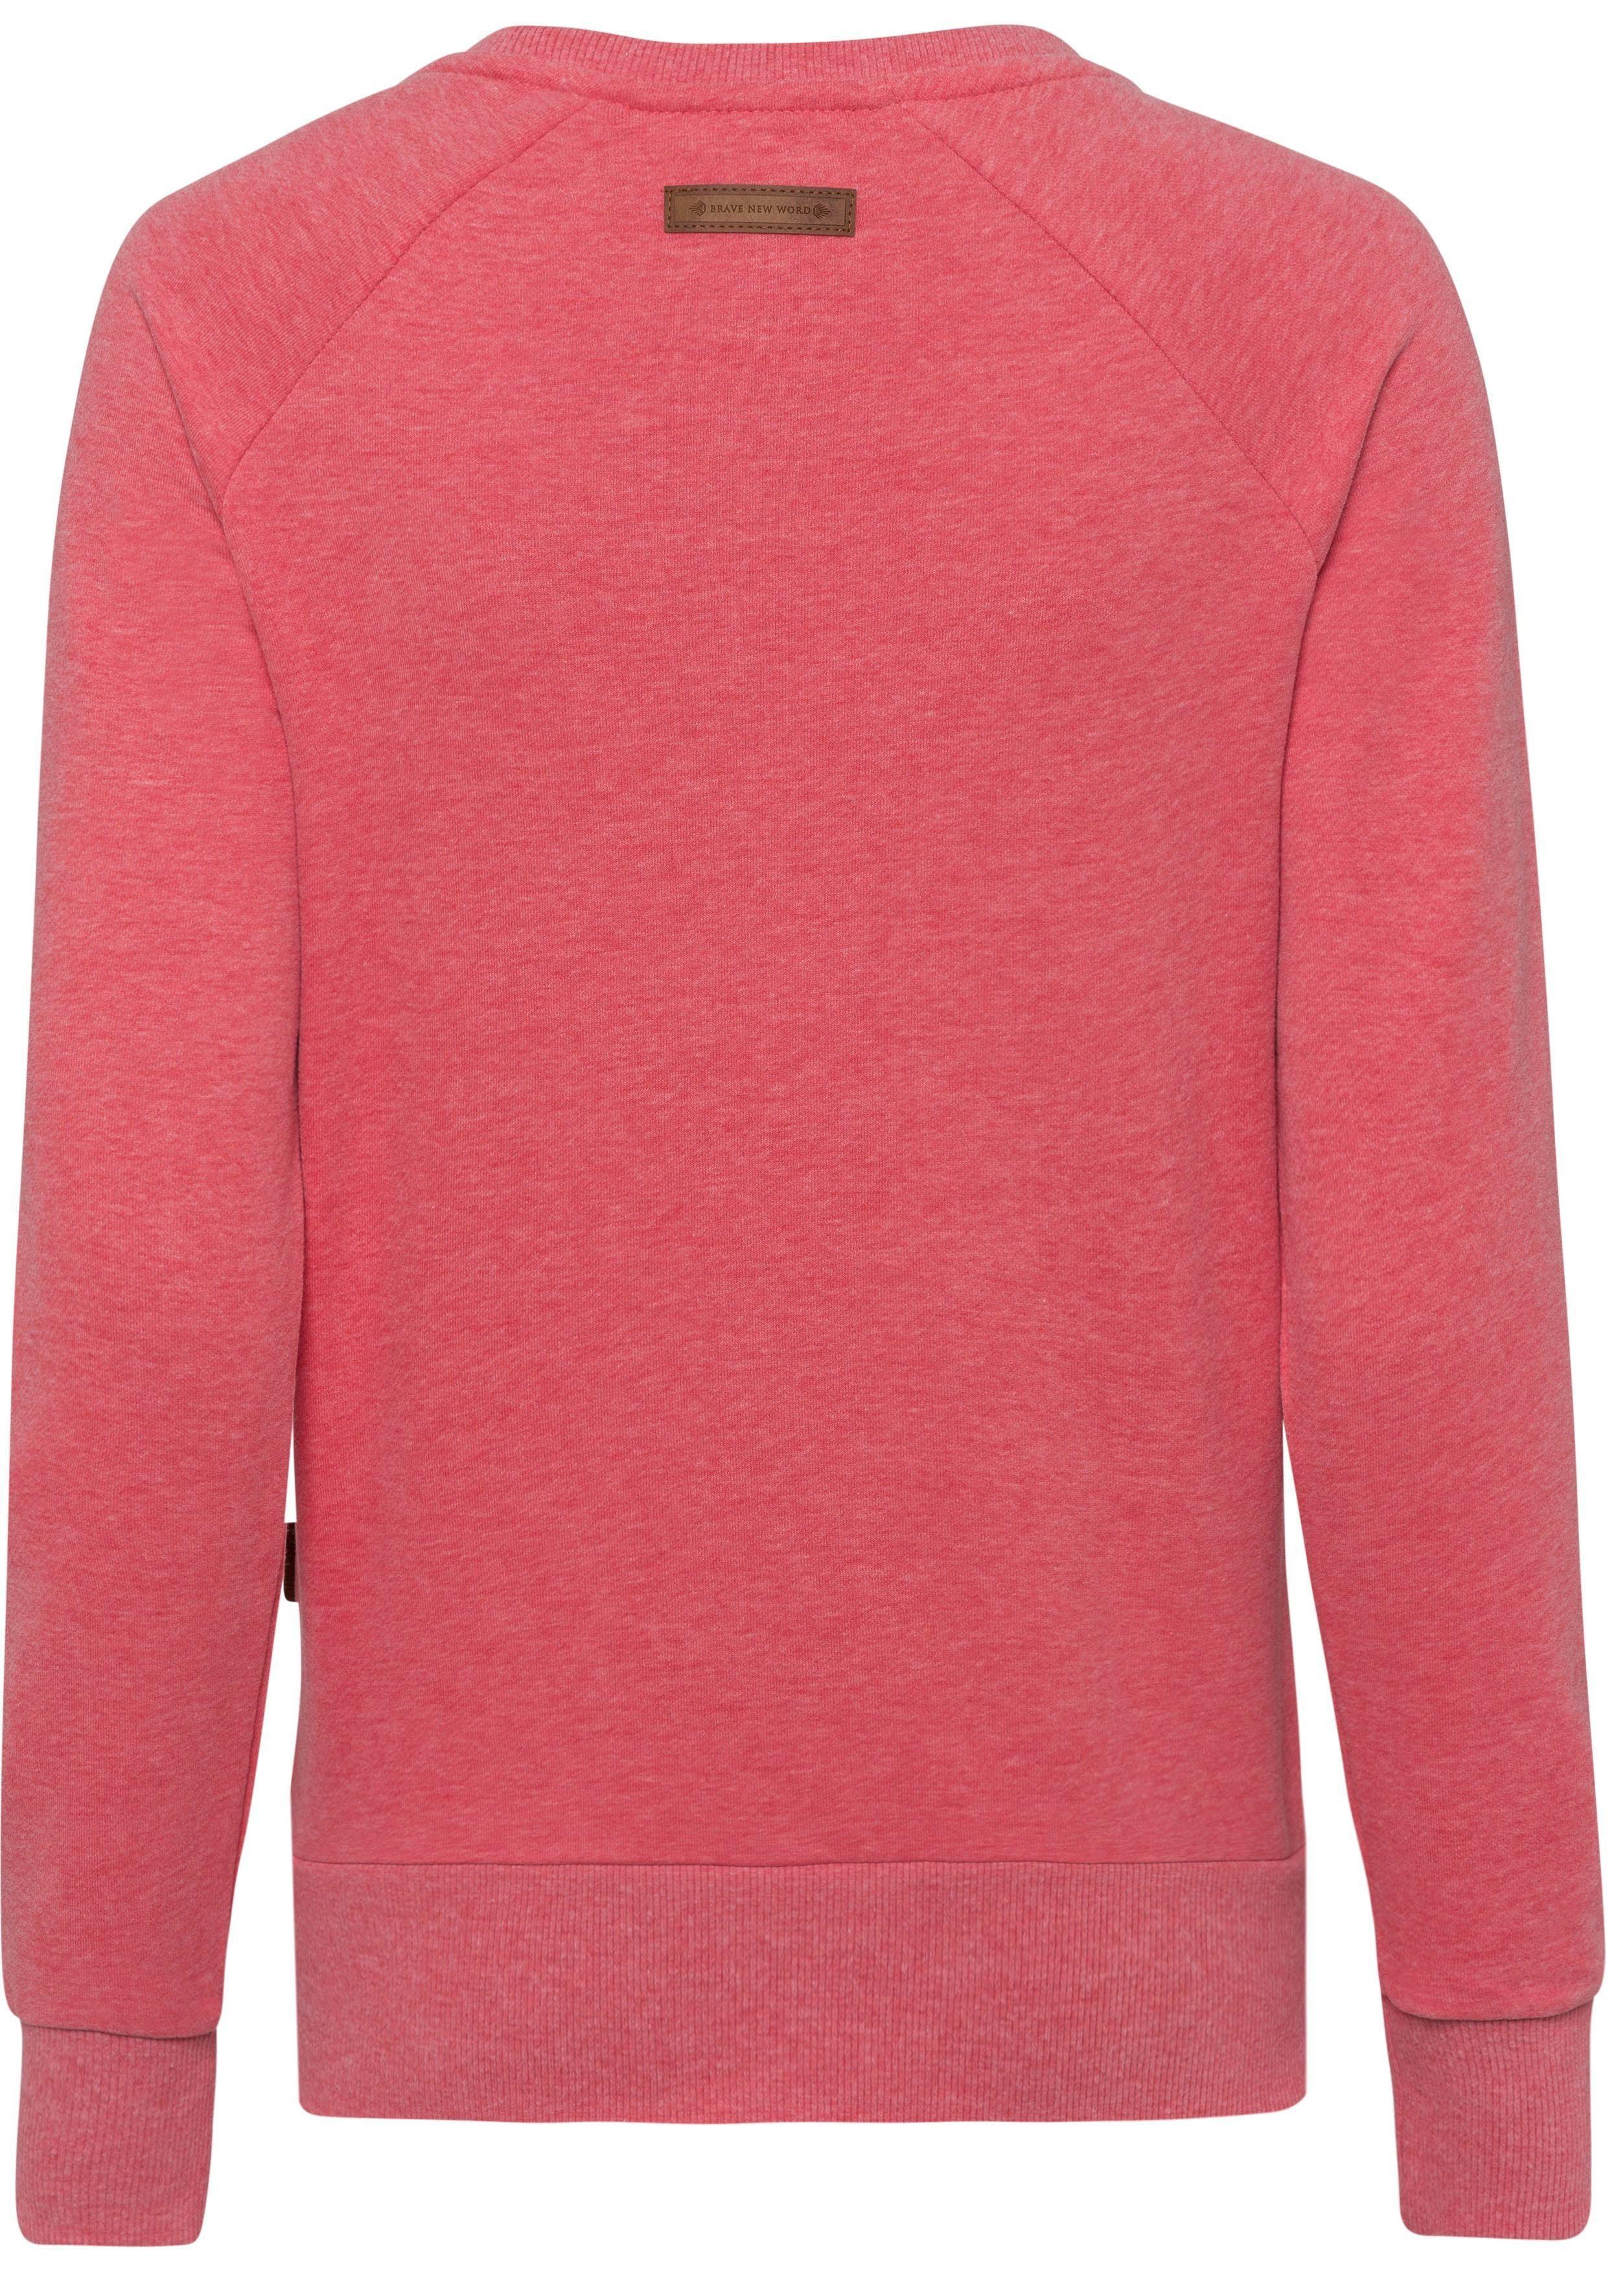 Online Naketano Sweatshirt Kaufen optik In Melange eY9IWEDH2